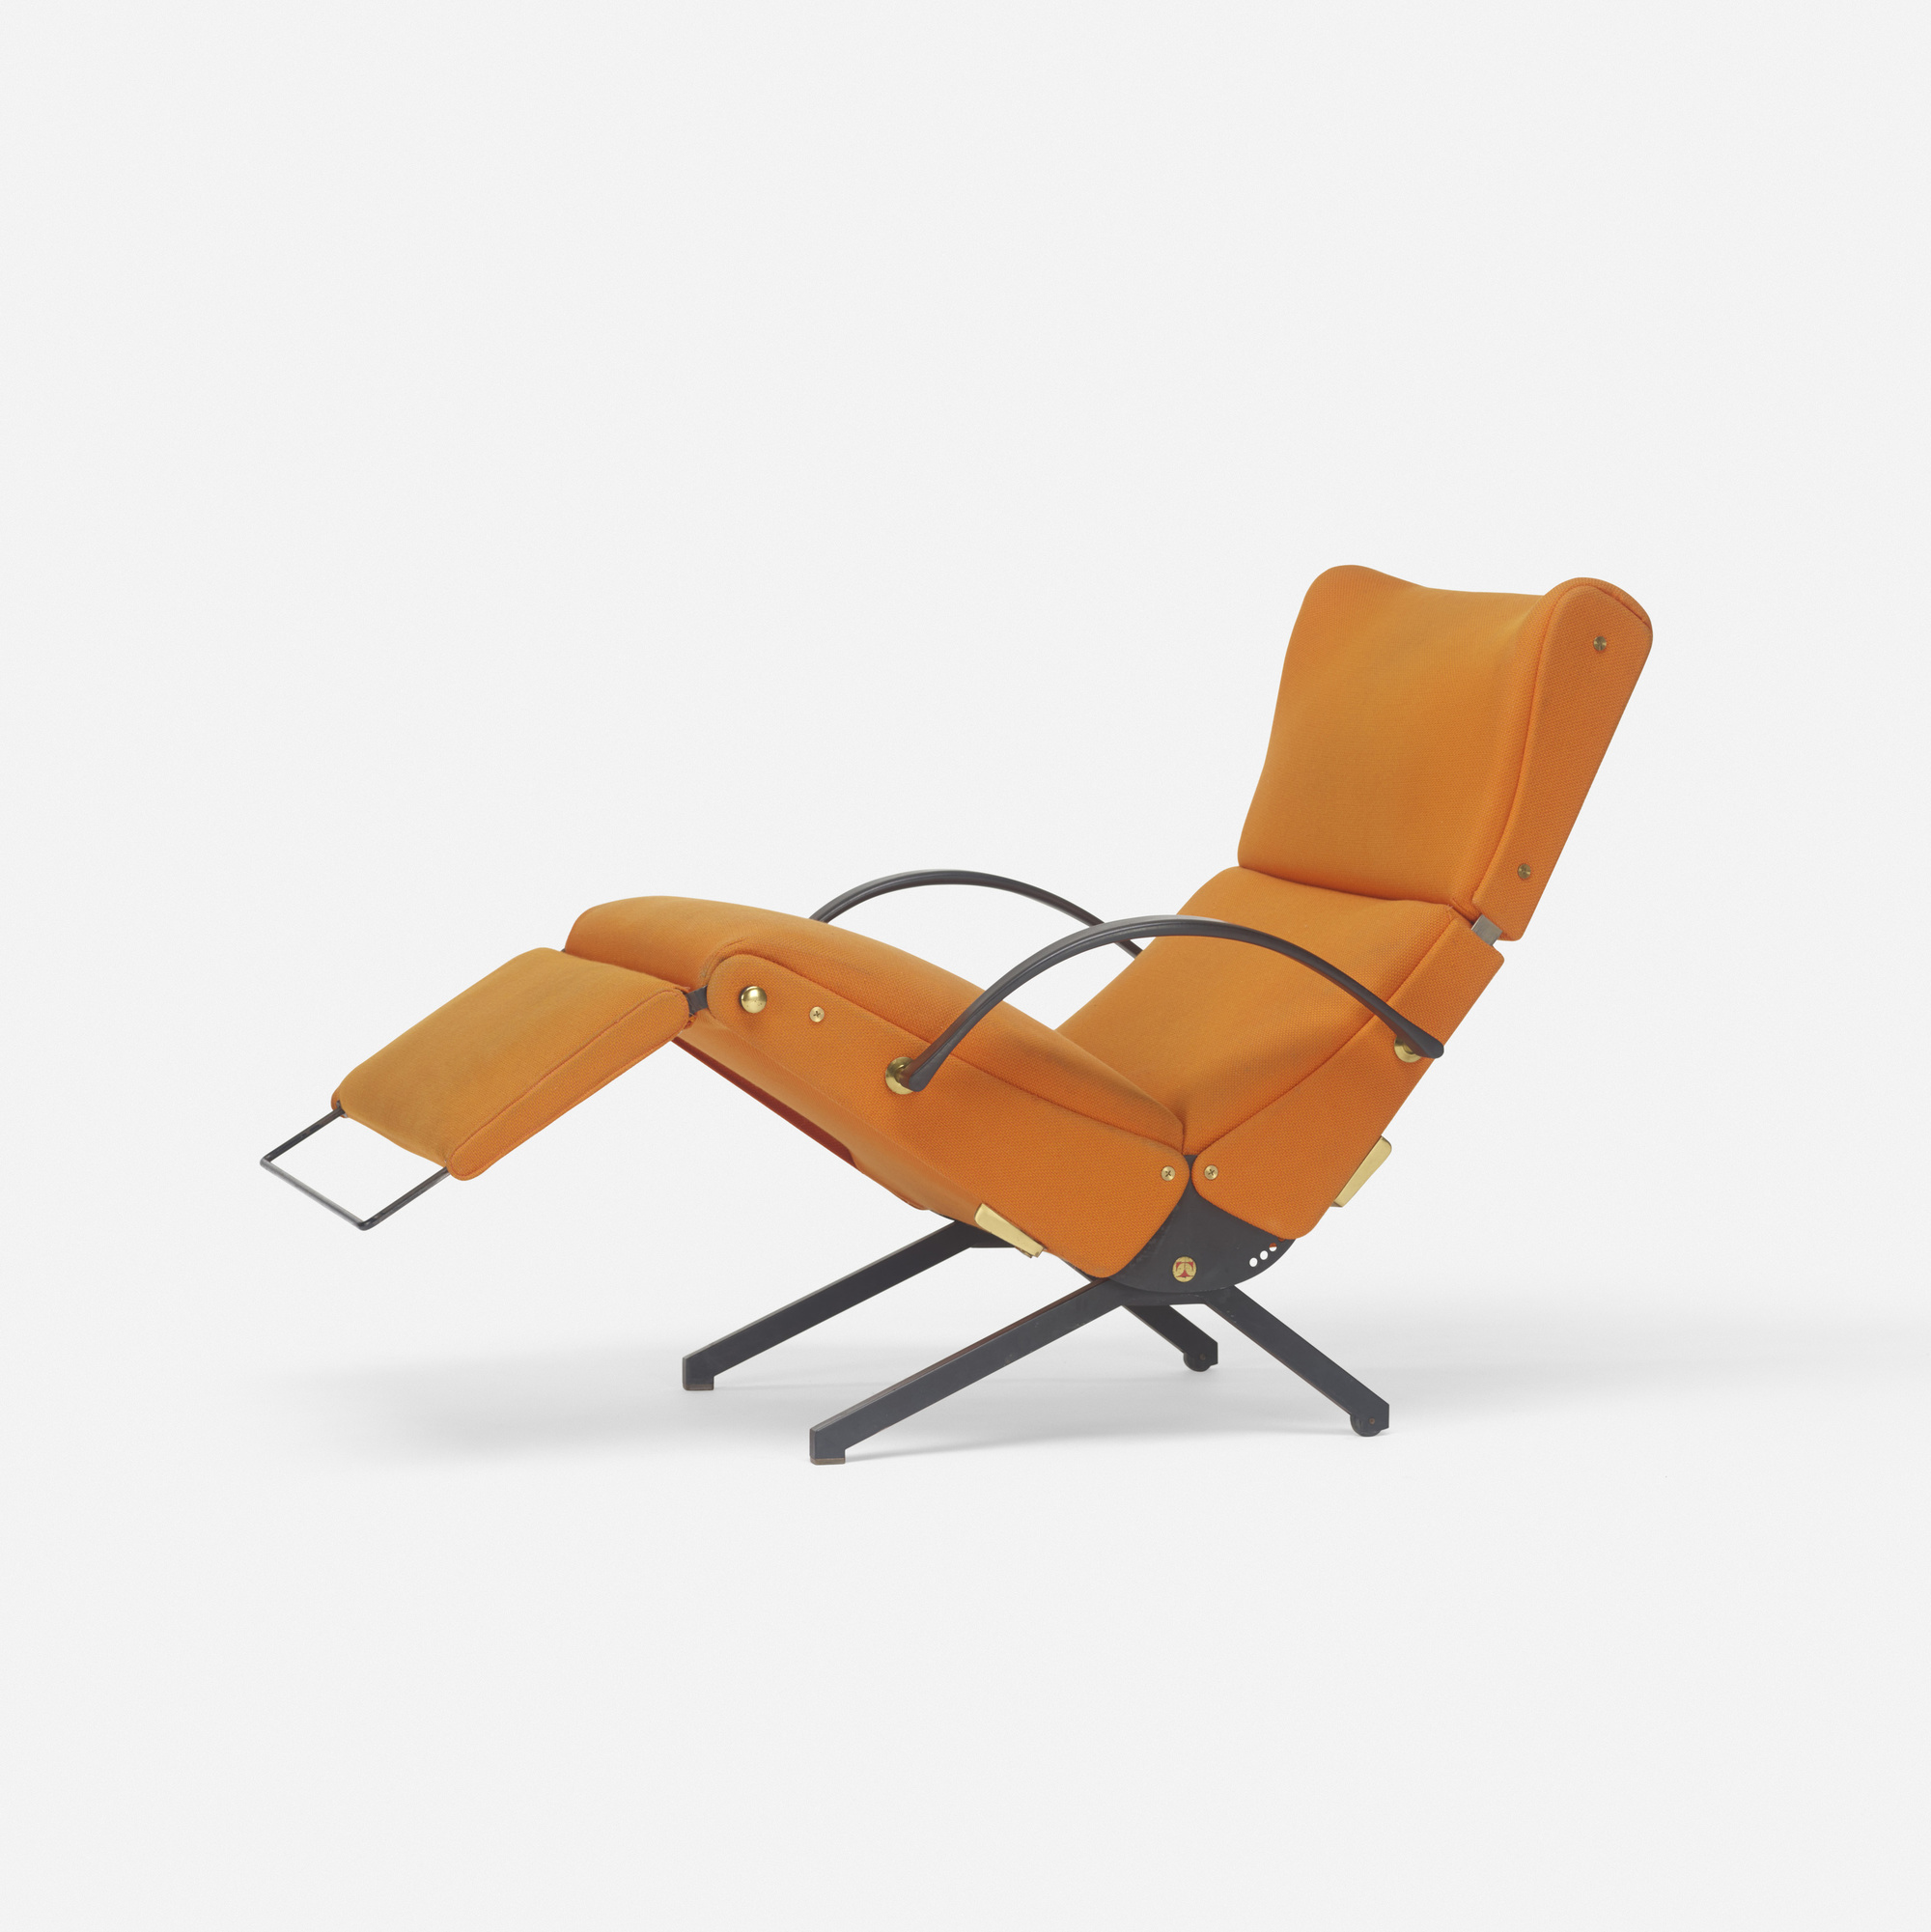 310: Osvaldo Borsani / P40 lounge chair (1 of 2)